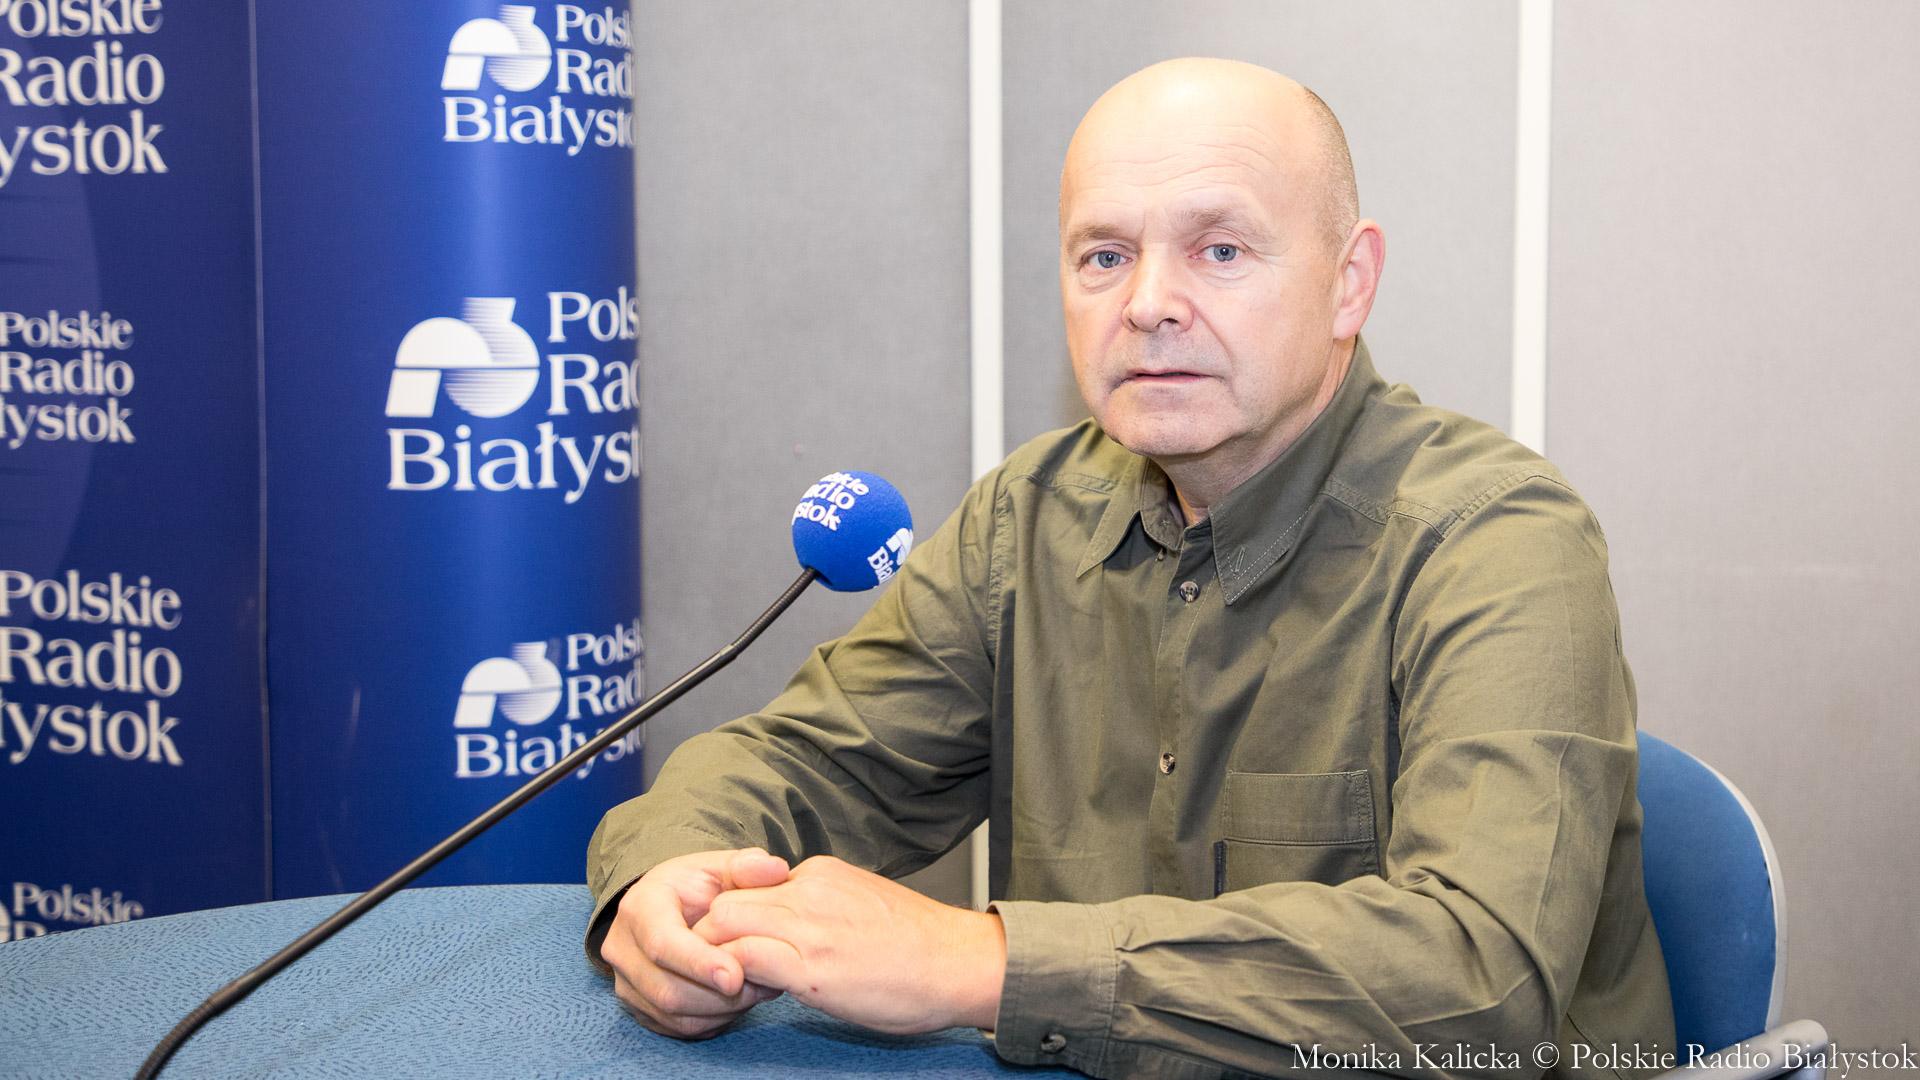 Tomasz Wiśniewski, fot. Monika Kalicka